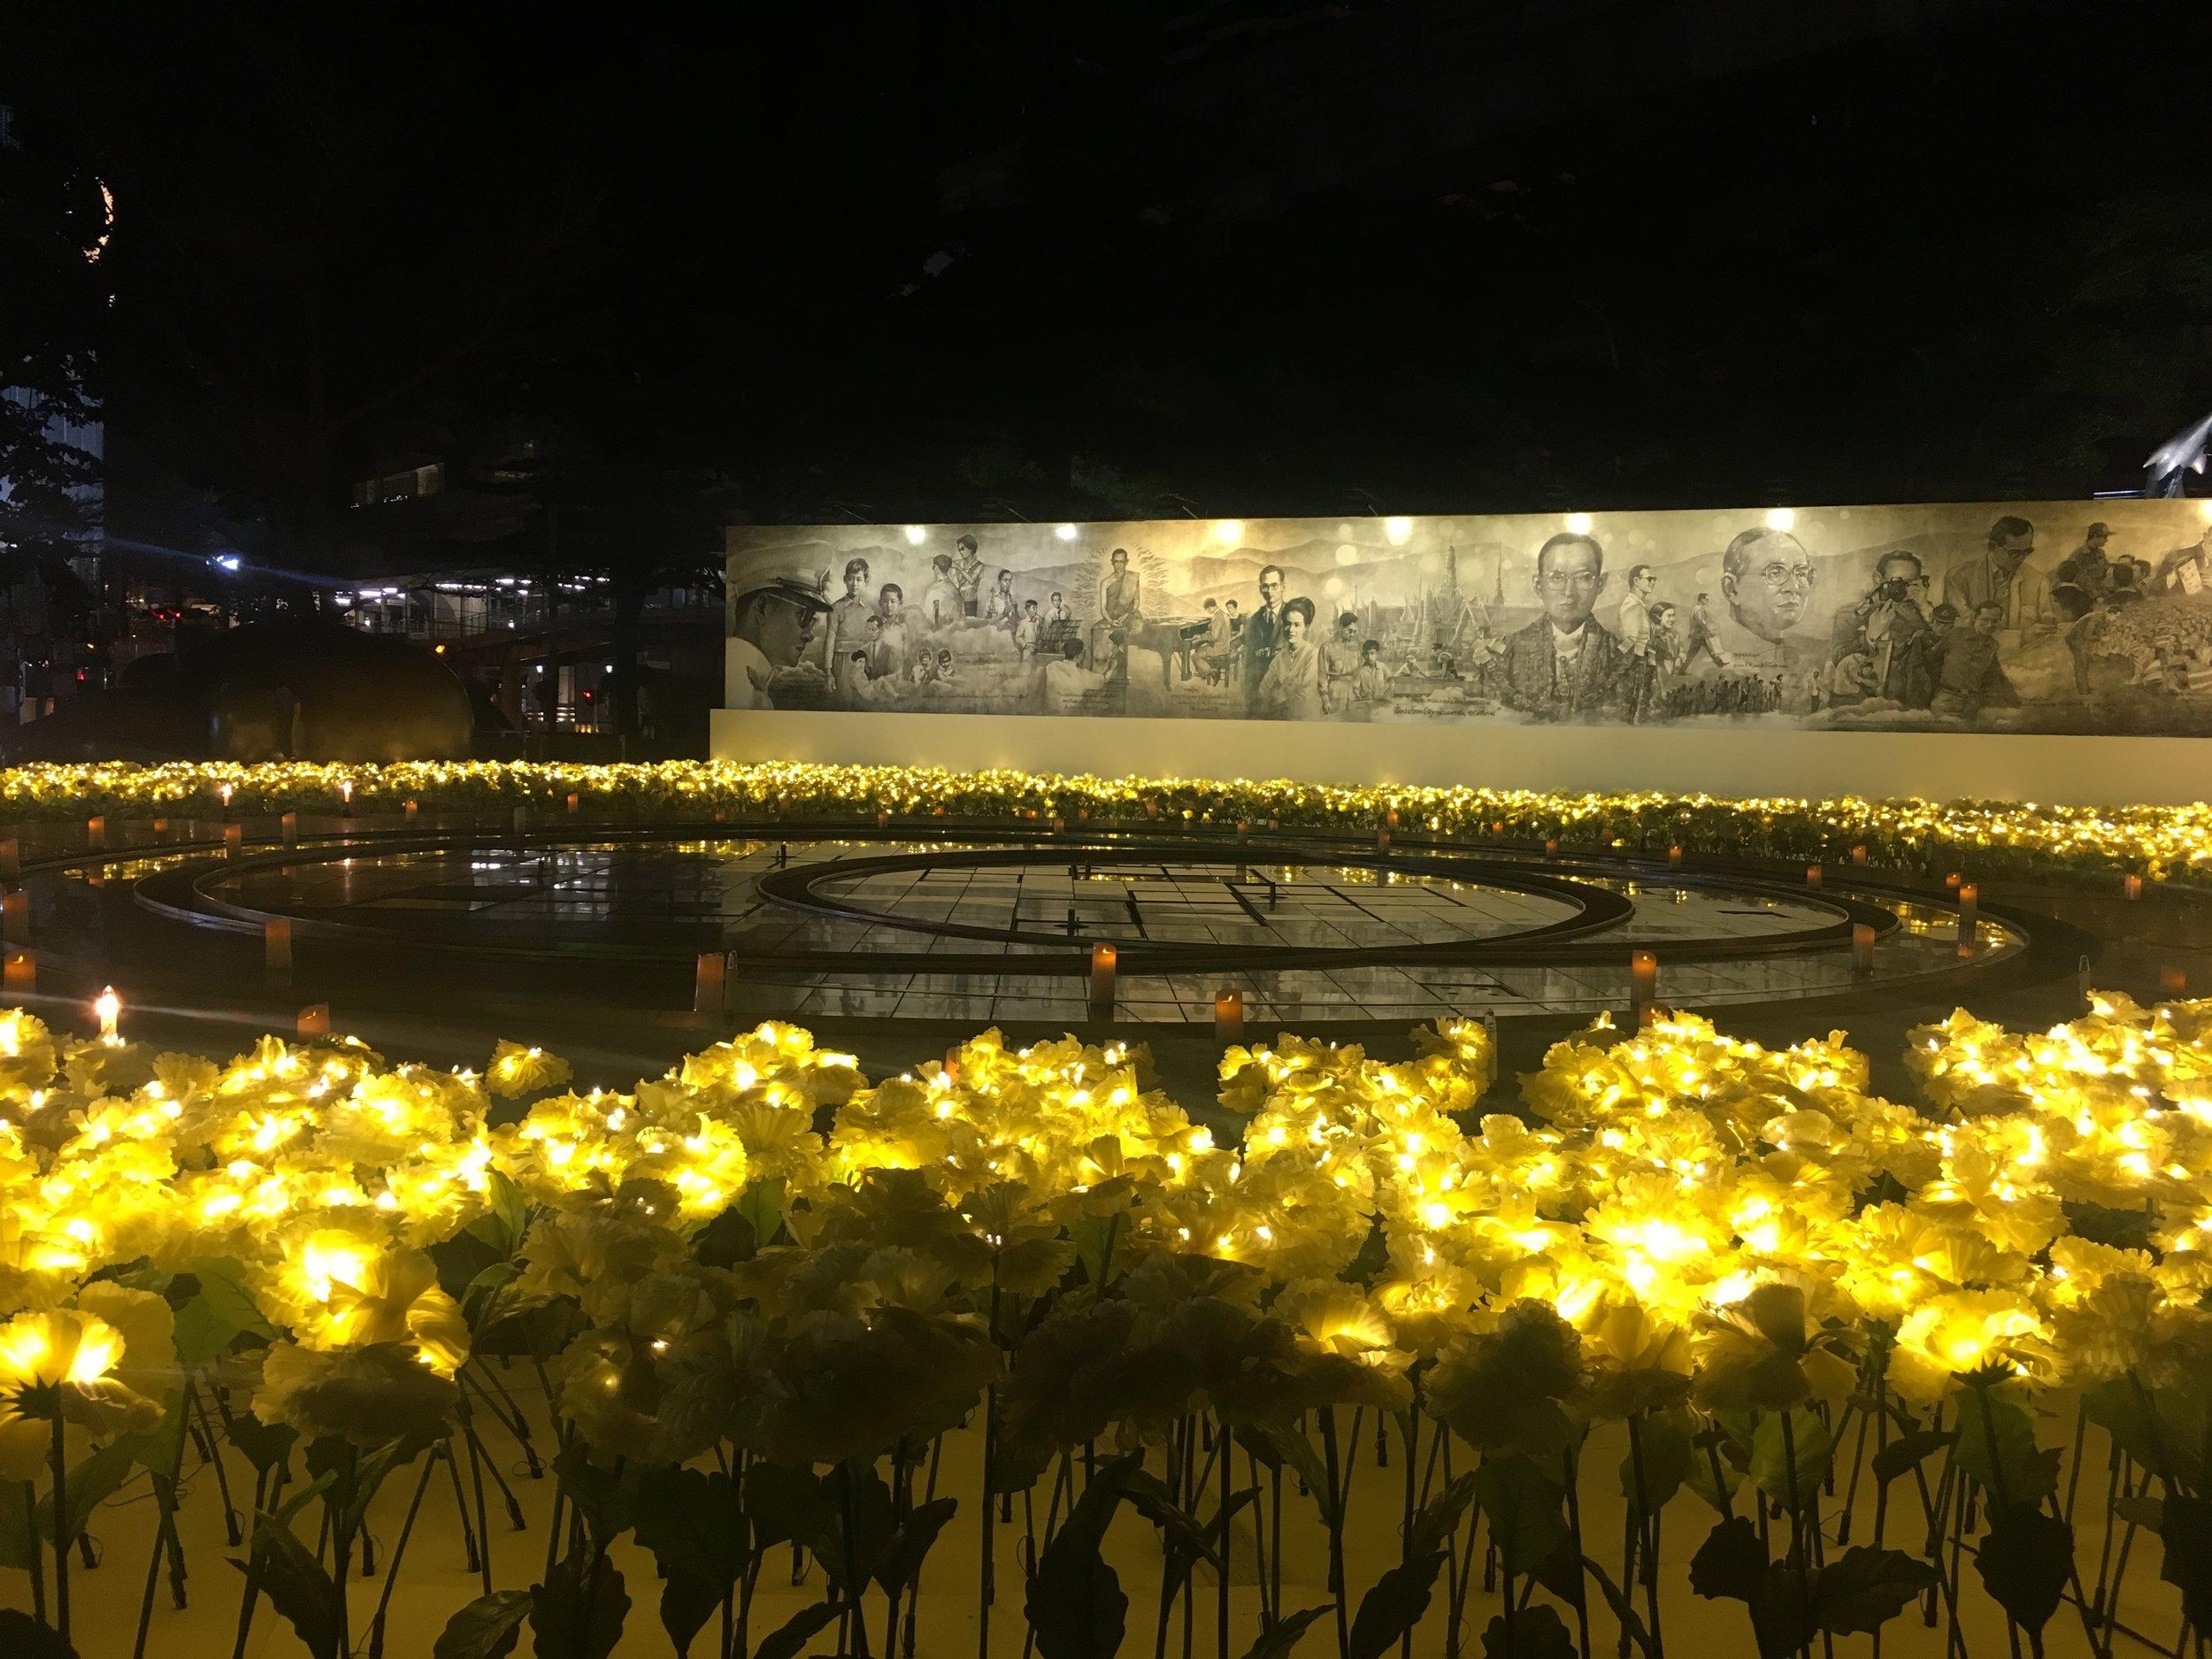 A elaborate display mourning the late Thai King Bhumibol Adulyadej is set up at Central World, Bangkok. (Credit: Dene-Hern Chen)